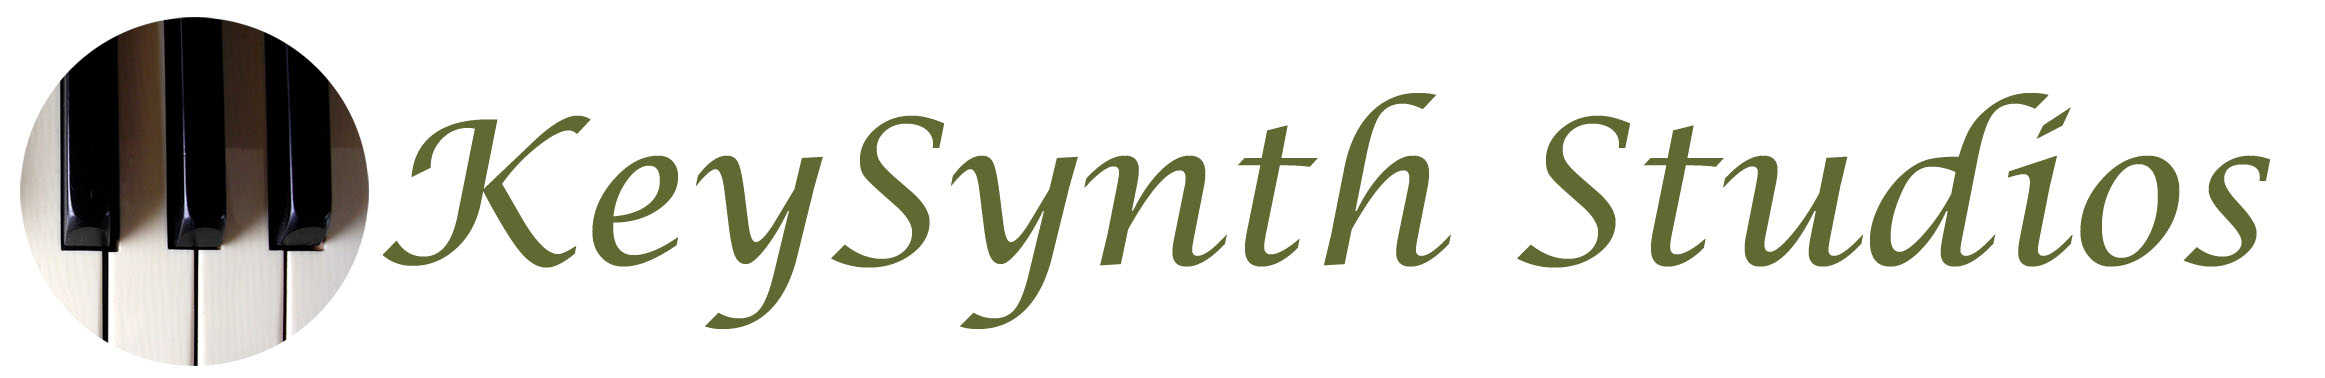 KeySynth Studios